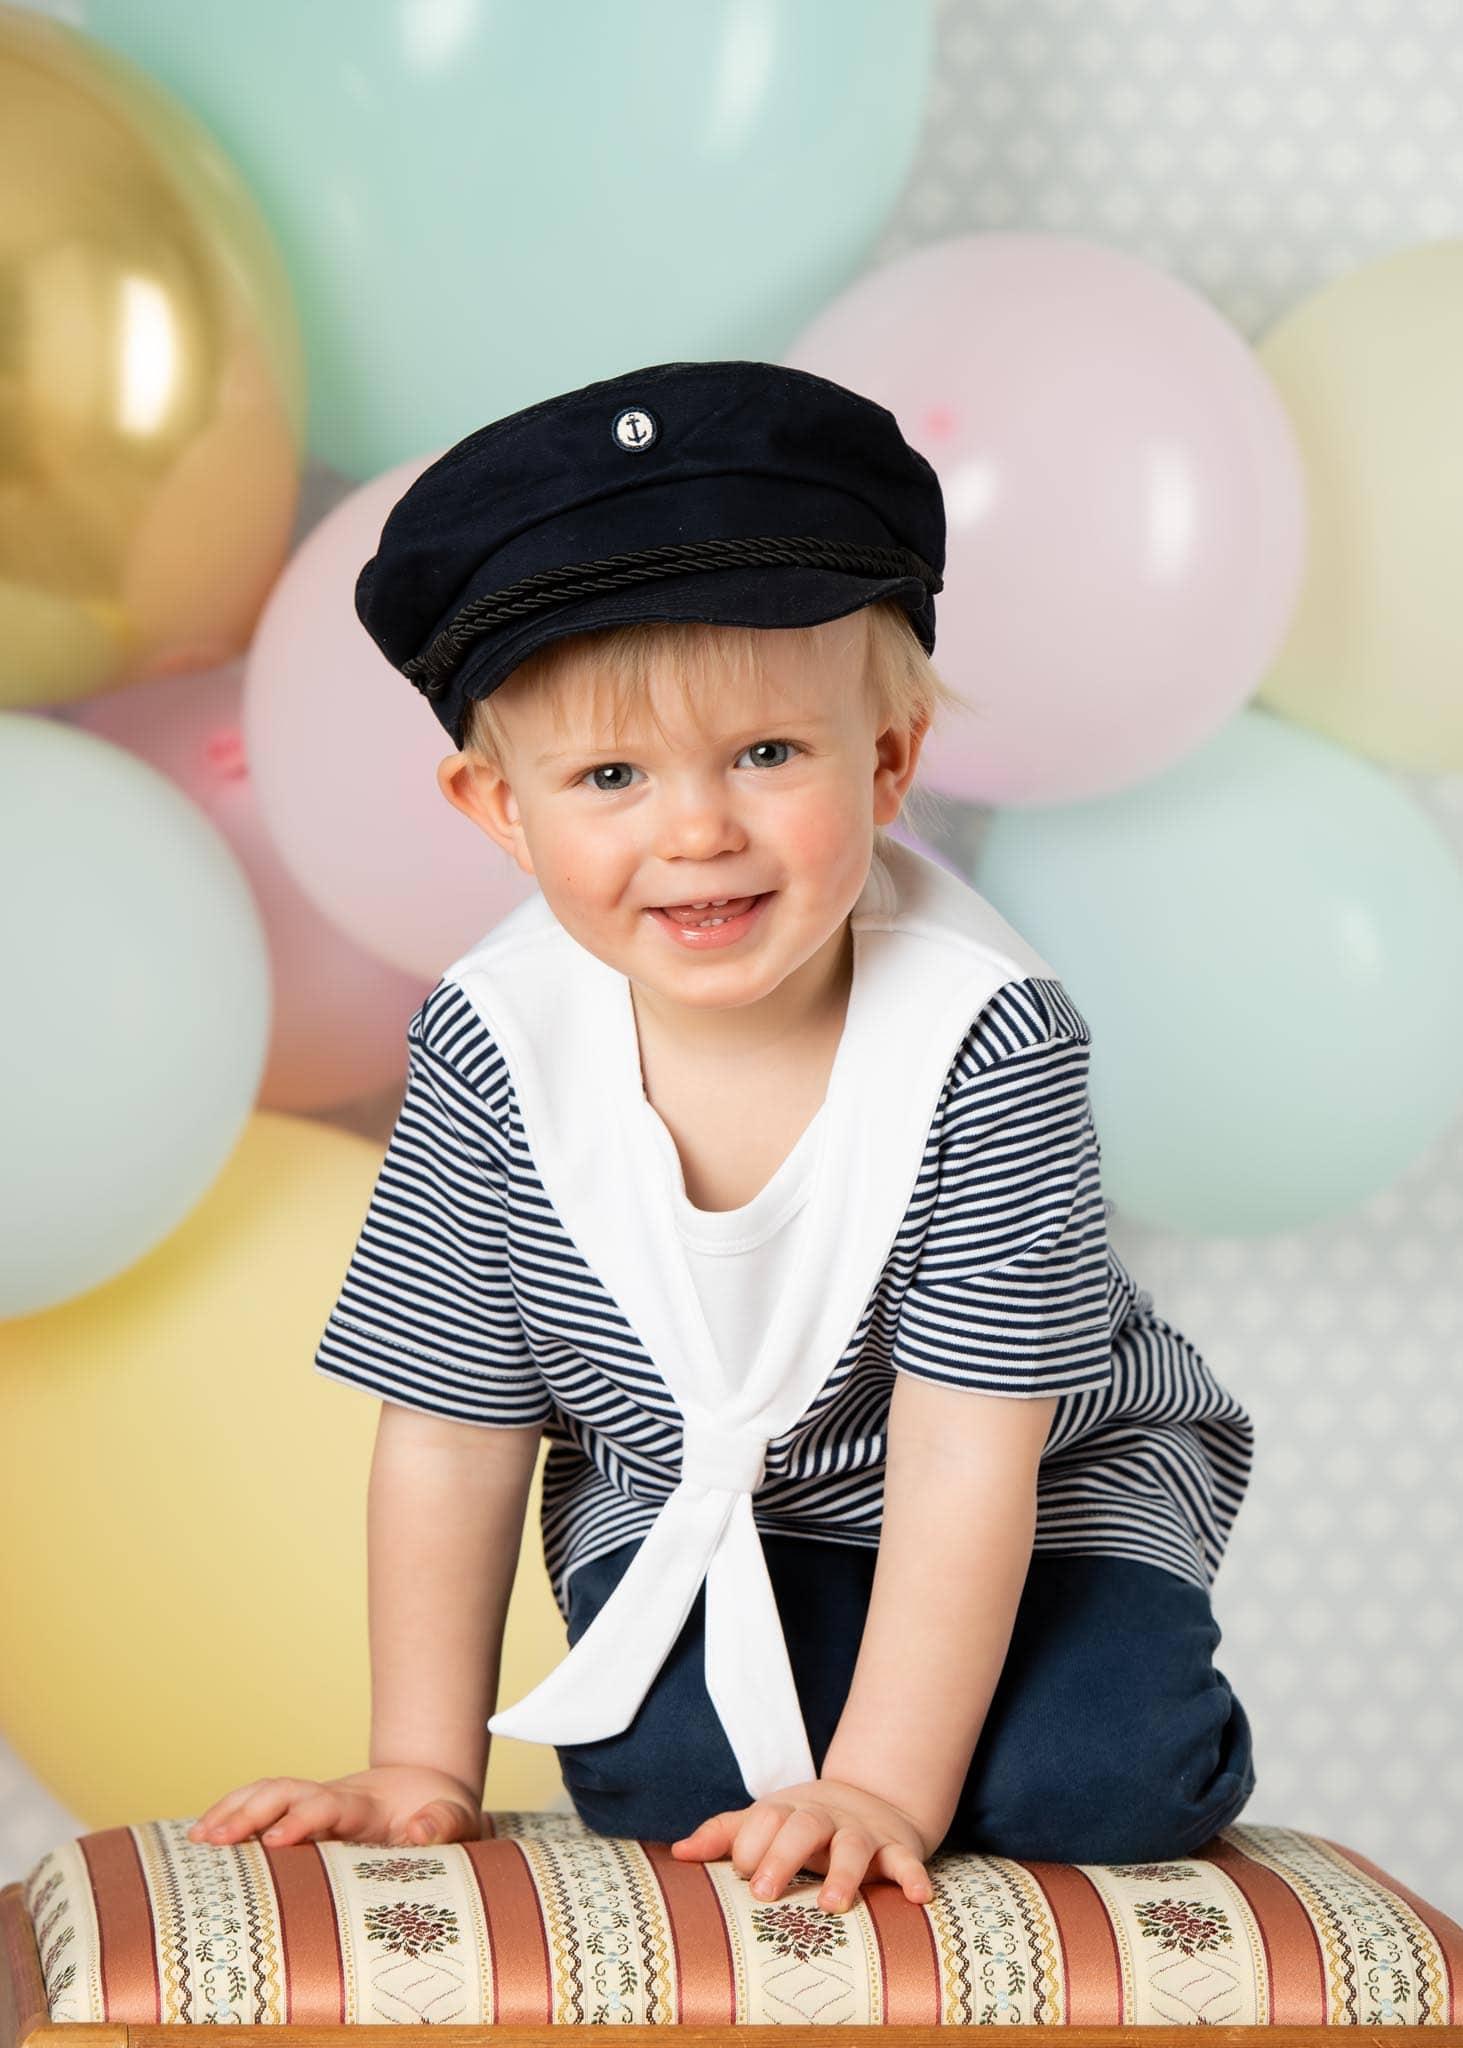 Barnfoto 2 årskort med ballonger